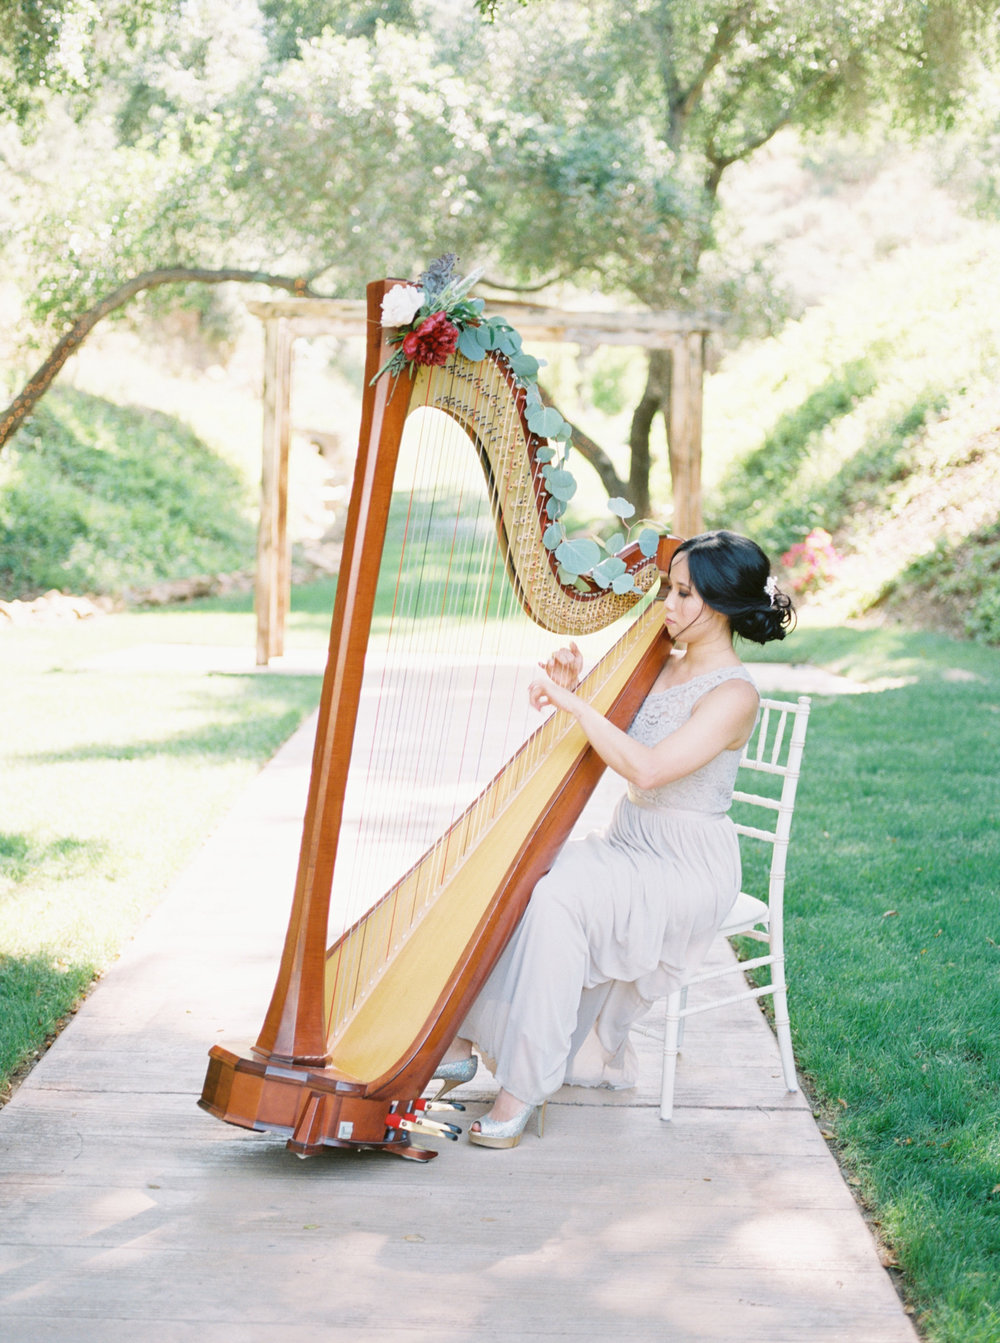 Solo - Harp.jpg